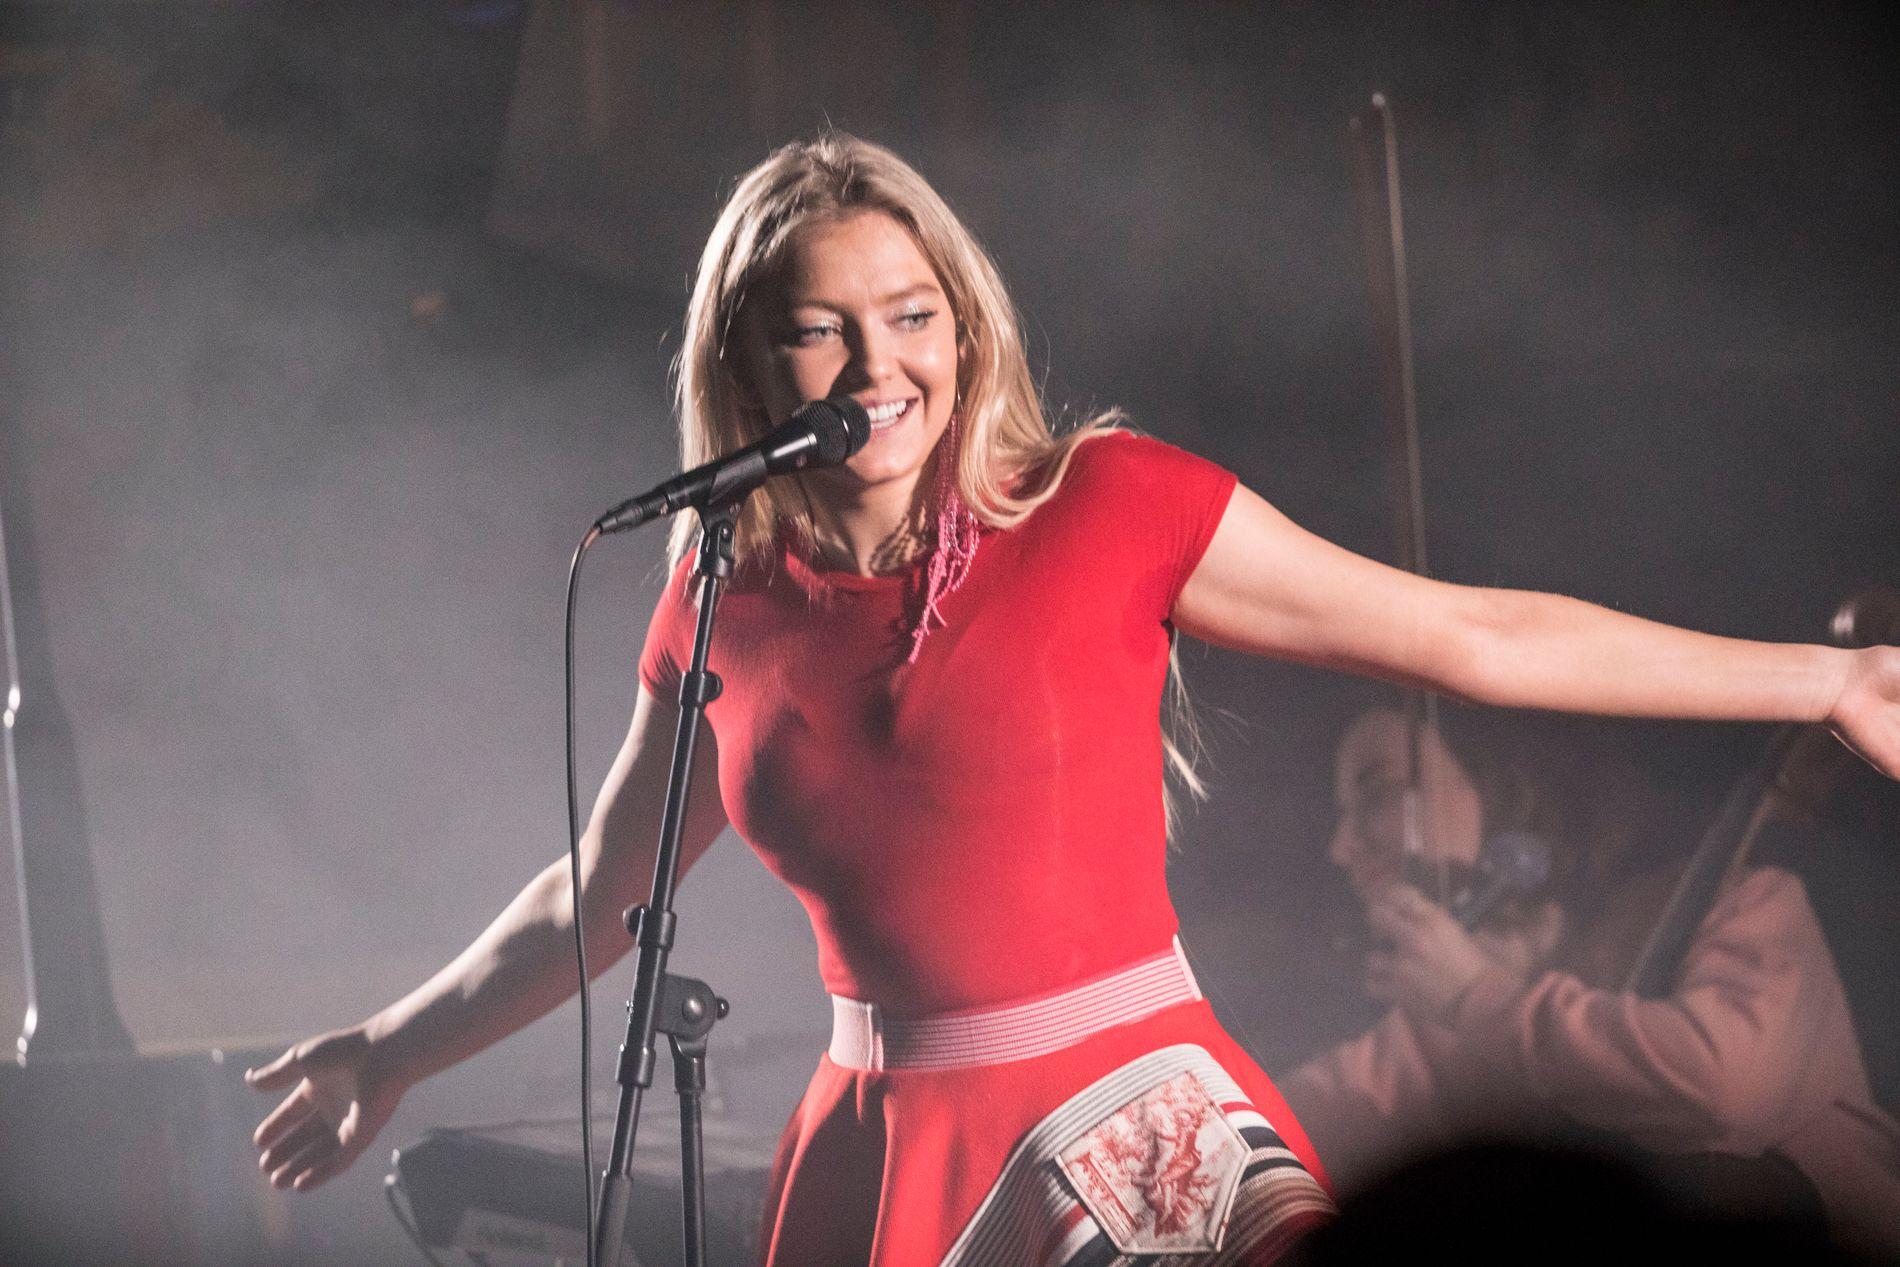 POPULÆR: Astrid Smeplass, her på Bylarm i kulturkirken Jacob, har 6,9 millioner ukentlige lyttere på Spotify.